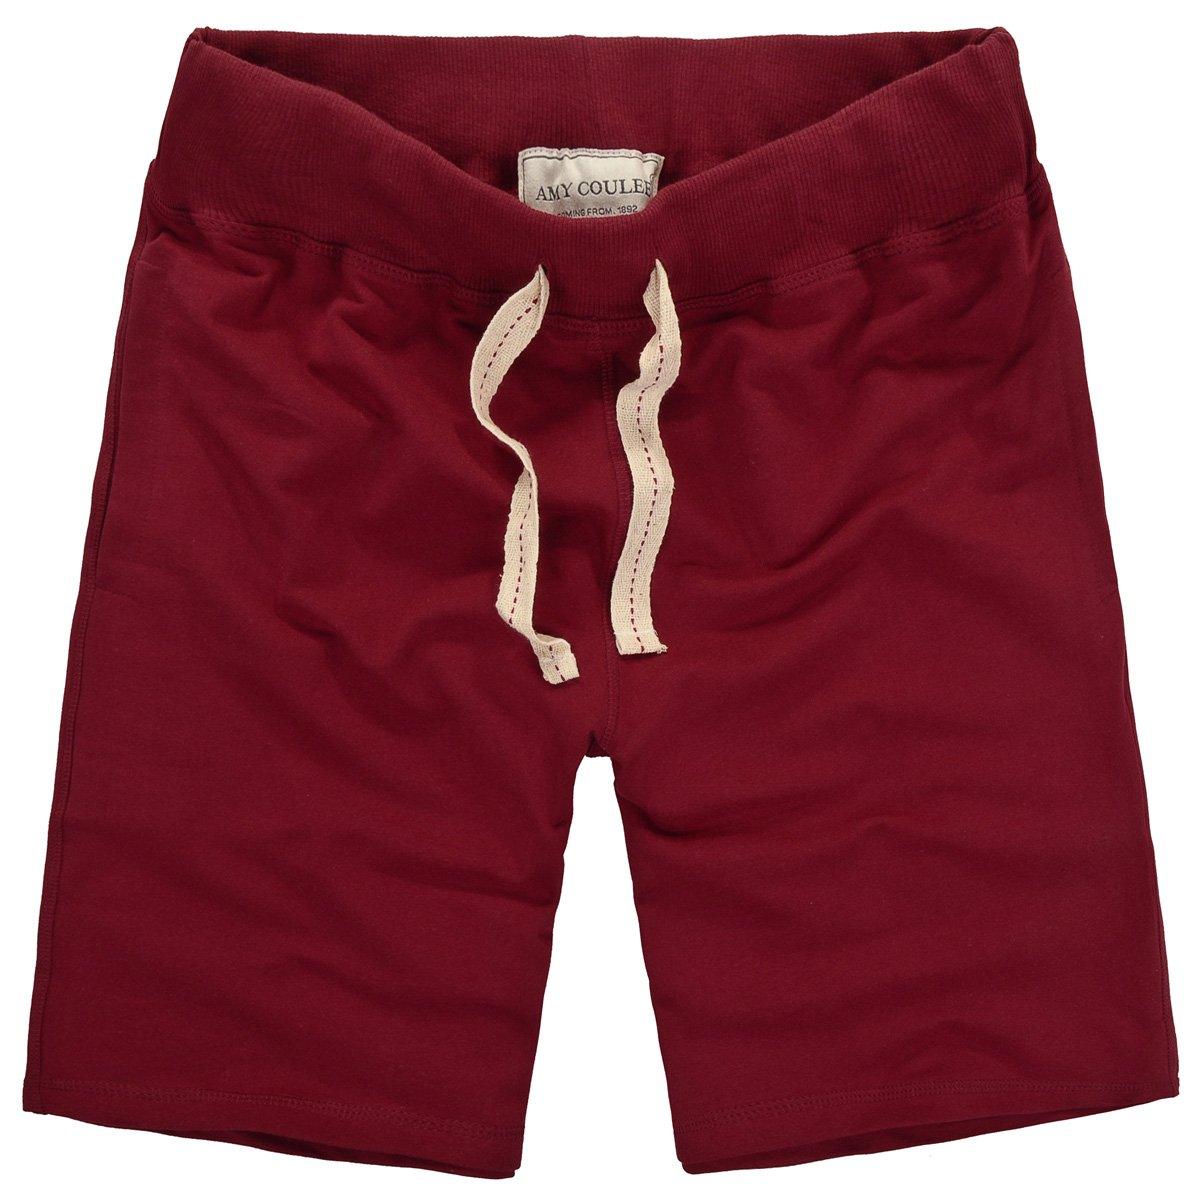 Amy Coulee Men's Casual Cotton Short (M, wine)